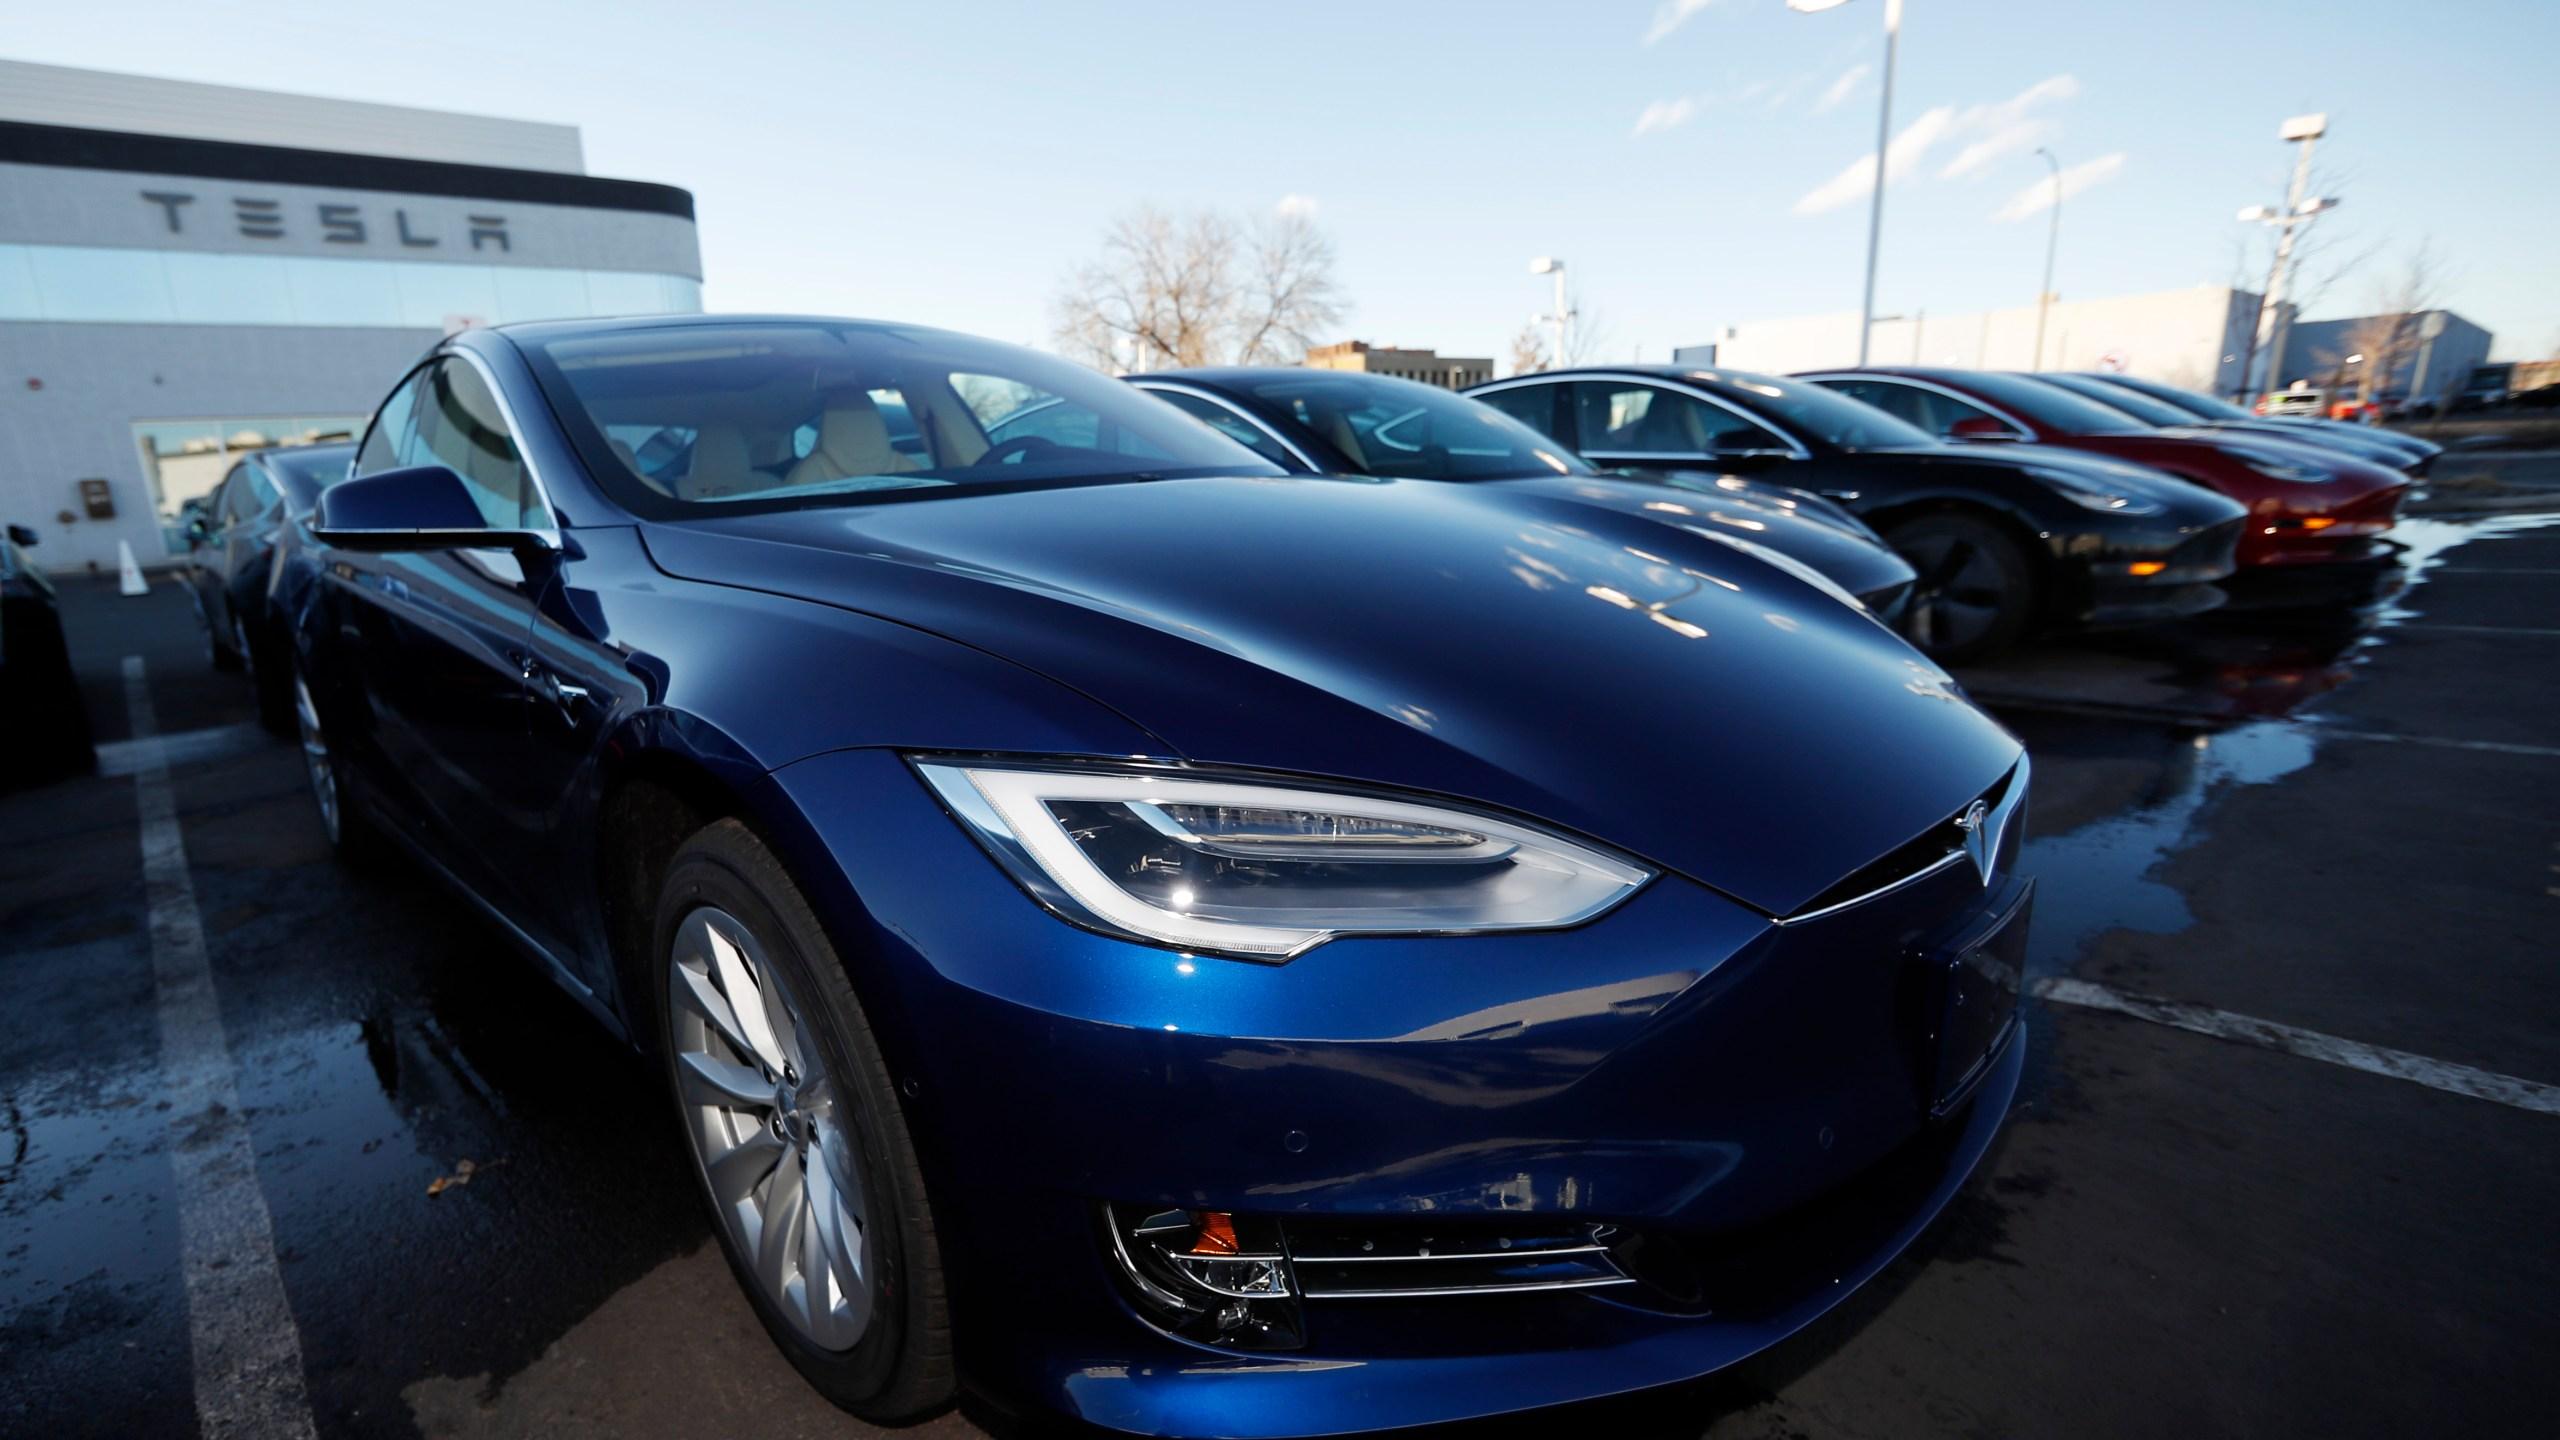 Tesla-Car_Production_95141-159532.jpg49612140